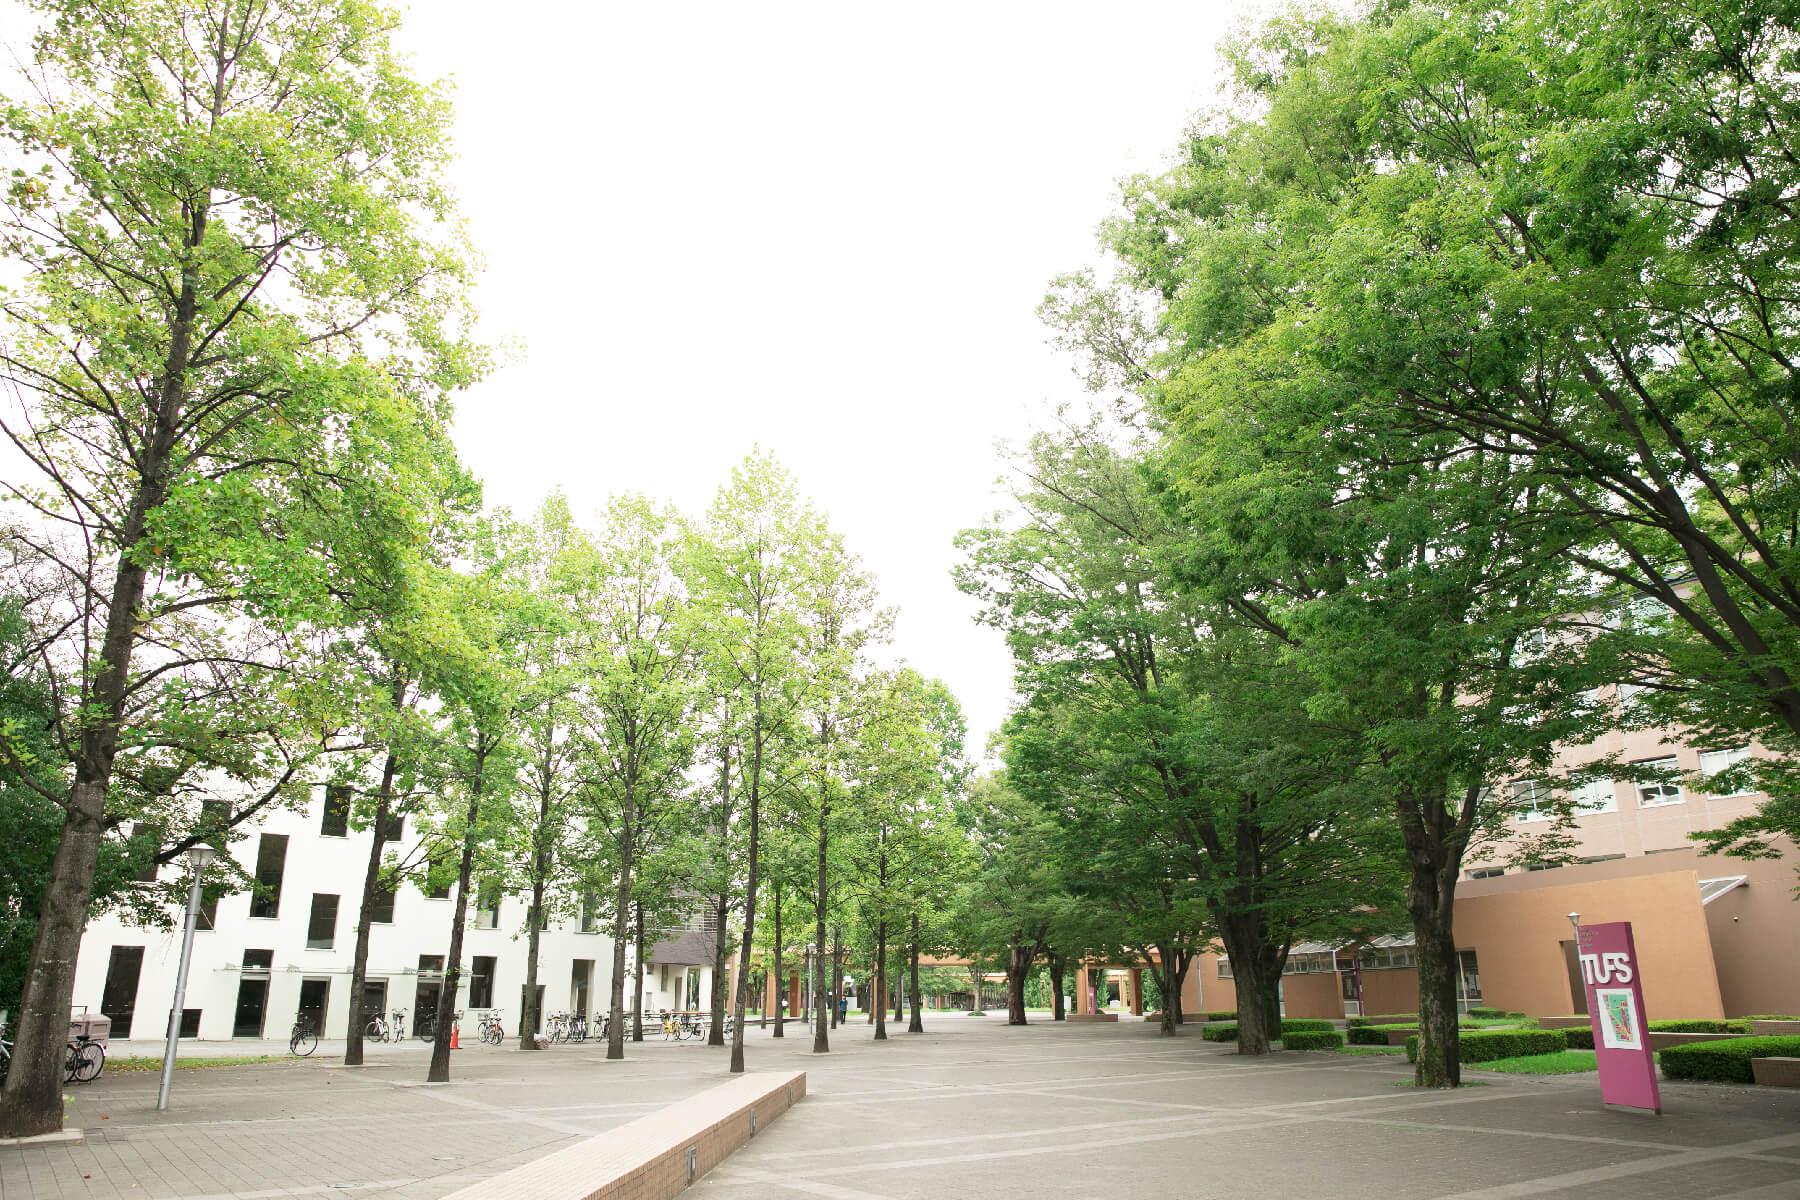 大学 語 東京 外国 【東京外国語大学】国際社会学部の評判とリアルな就職先